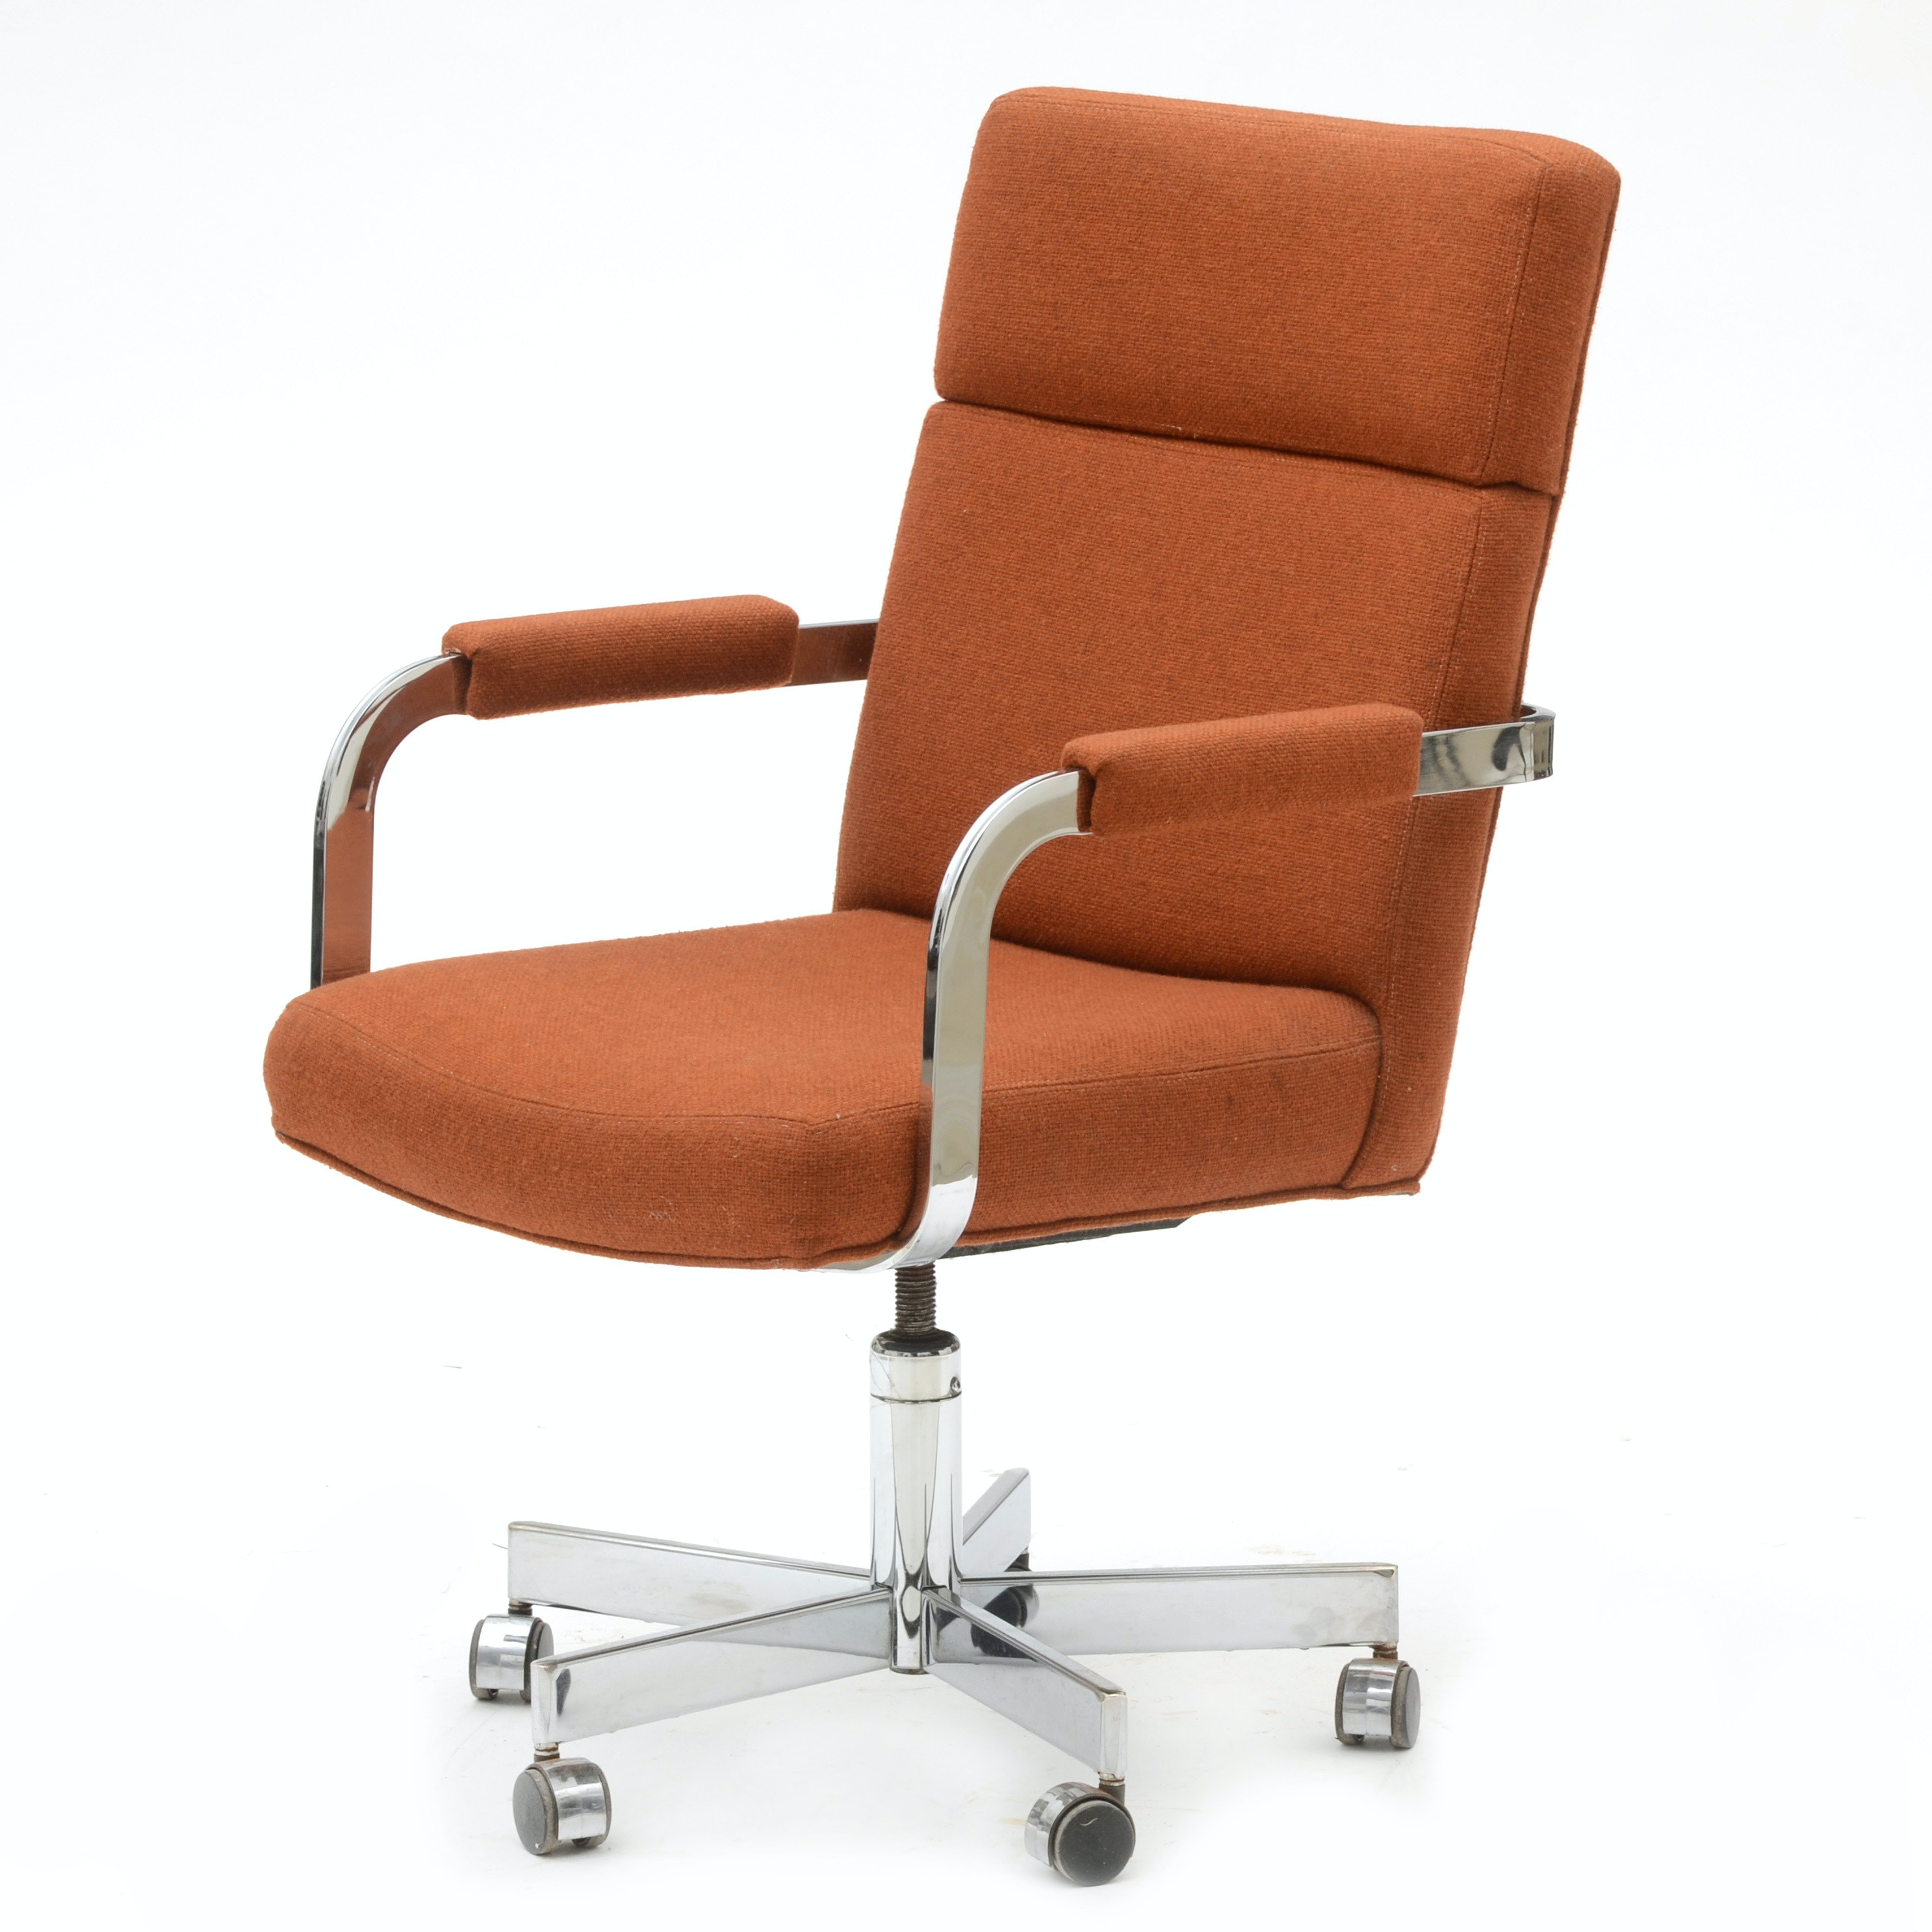 Milo Baughman's Executive Office Chair